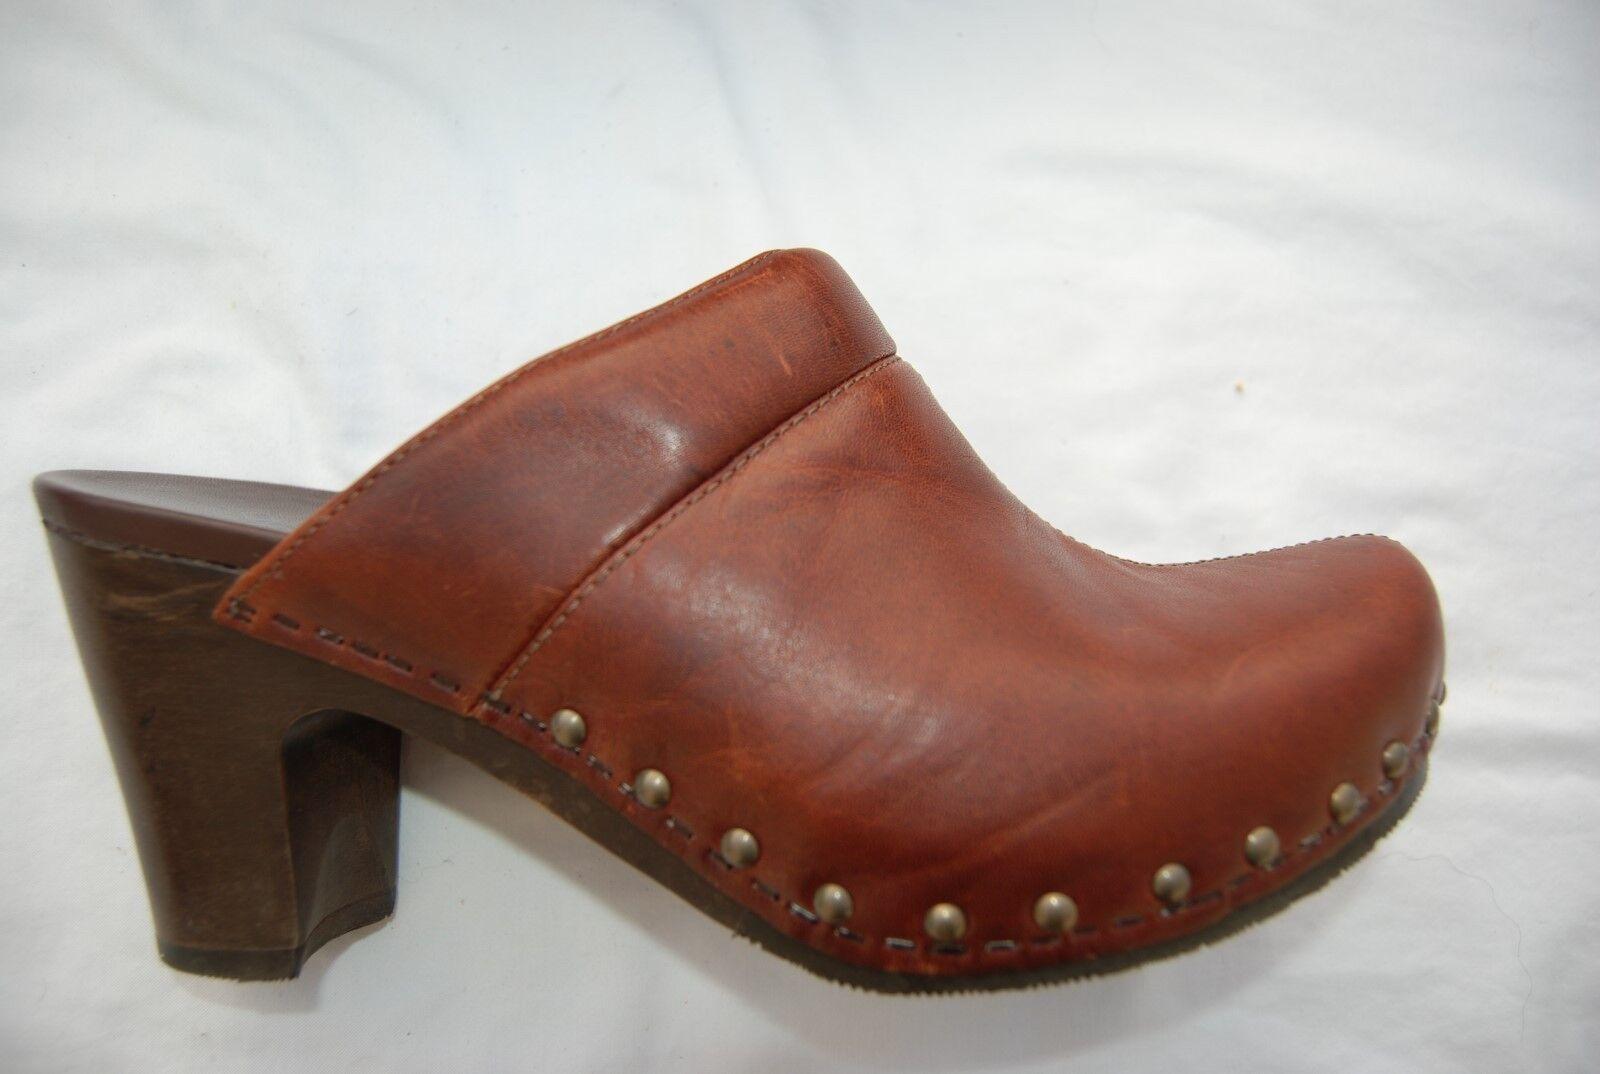 Dark Brown Leather DANSKO Backless Tall Clog Heels w/Studs US 7.5 - 8